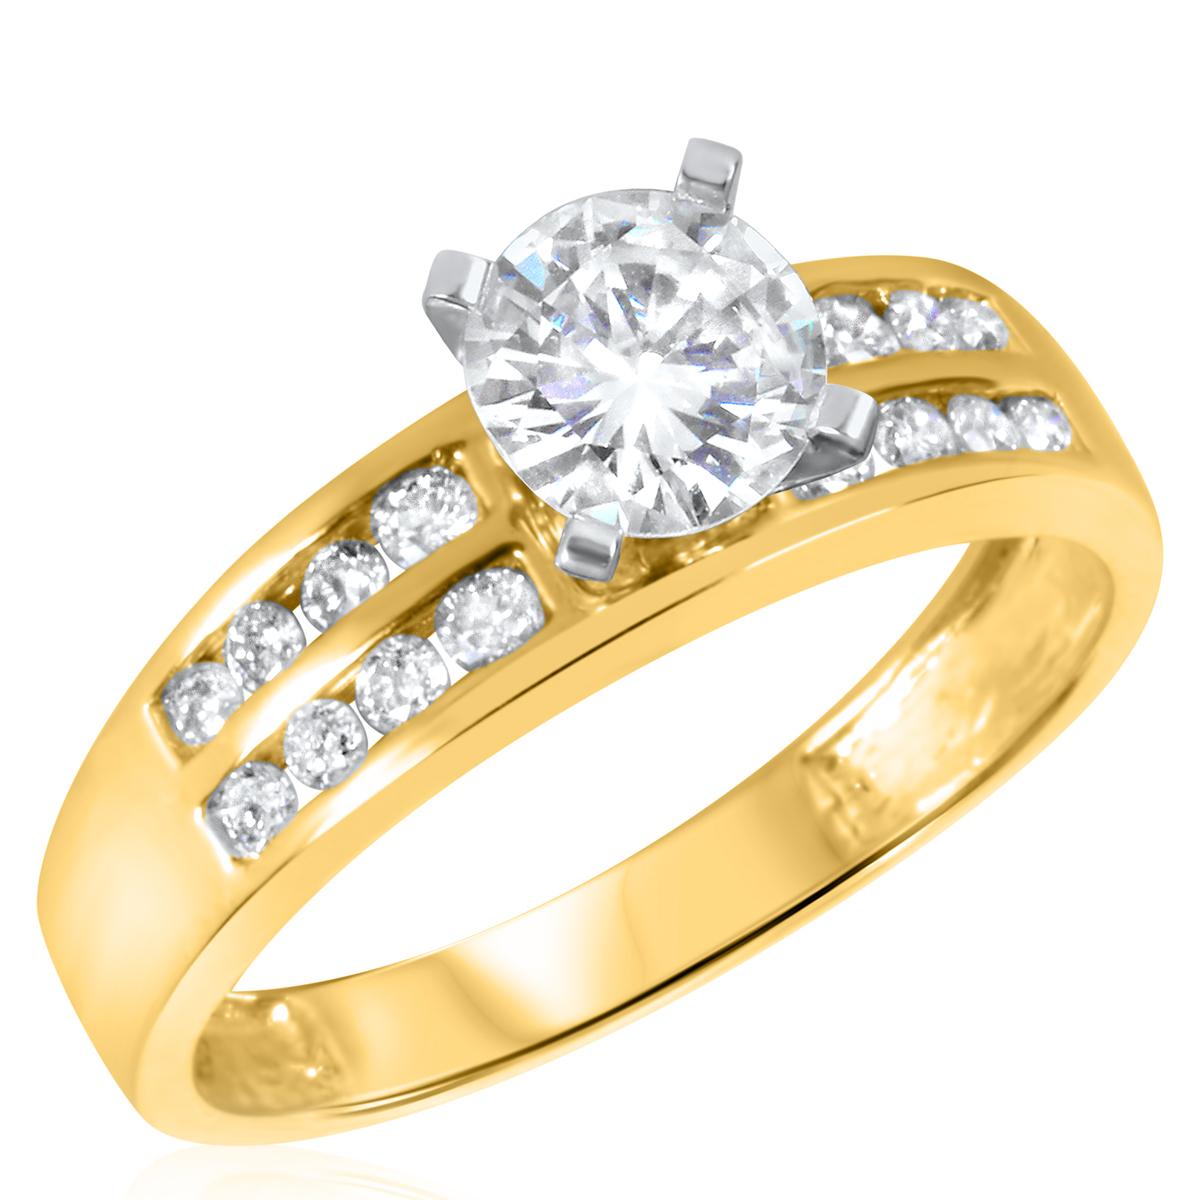 1 1/10 CT. T.W. Diamond Ladies Engagement Ring 10K Yellow Gold- Size 8